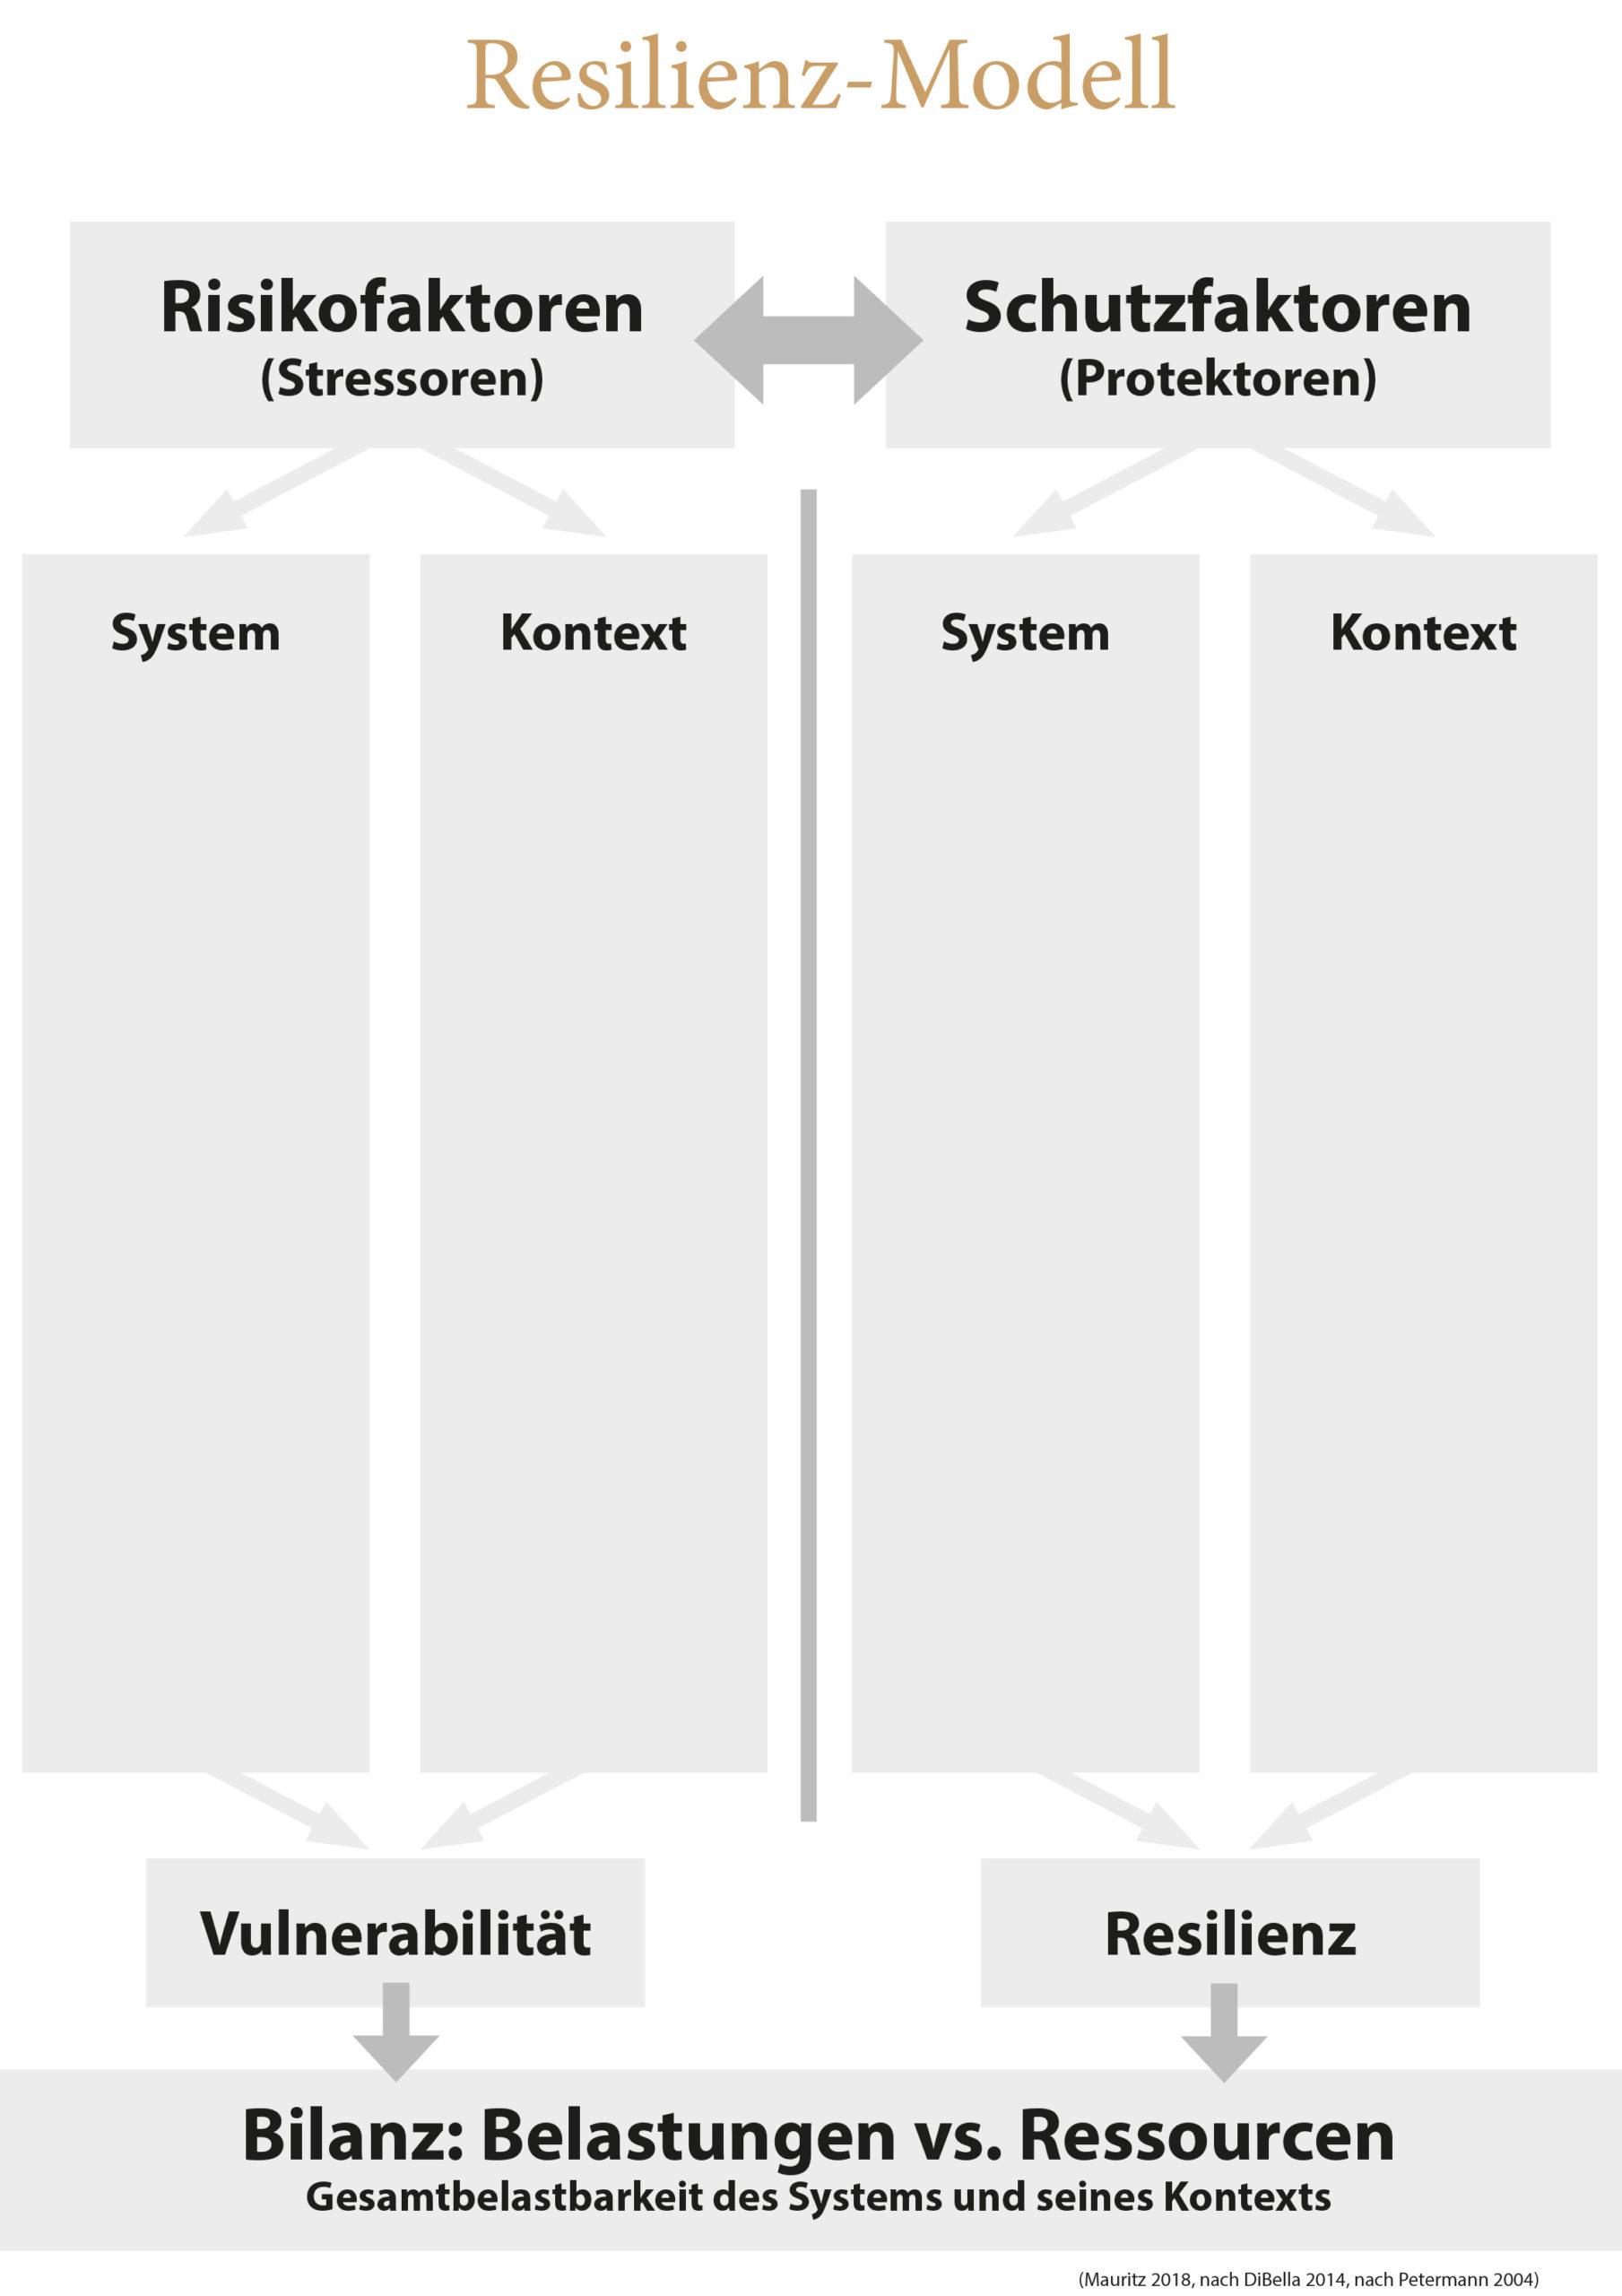 Resilienz-Modell, Sebastian Mauritz